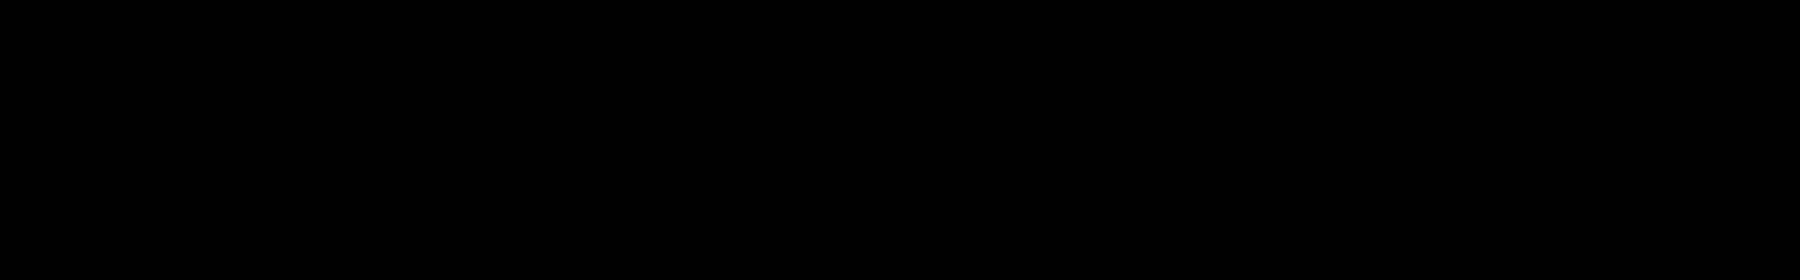 Septagon Vocals audio waveform